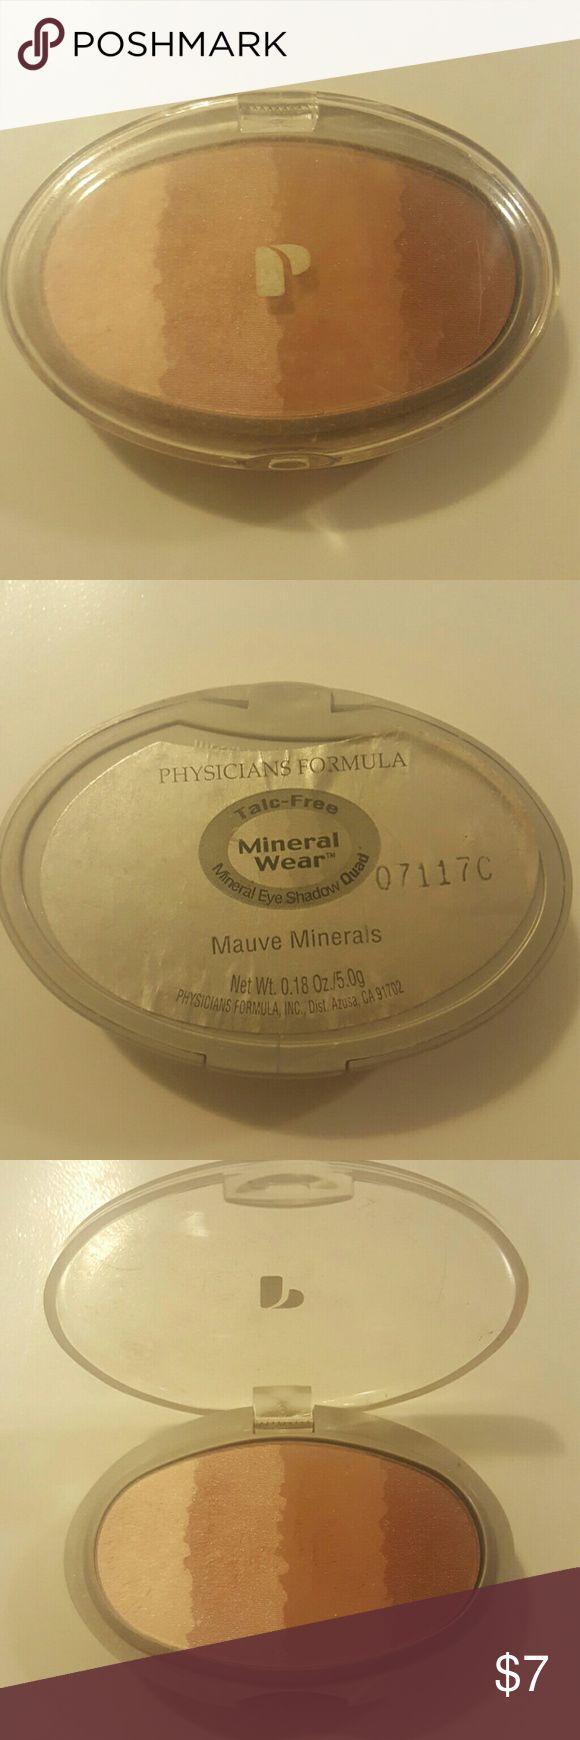 Physicians Formula Eye Shadow Mauve minerals Physicians Formula Makeup Eyeshadow